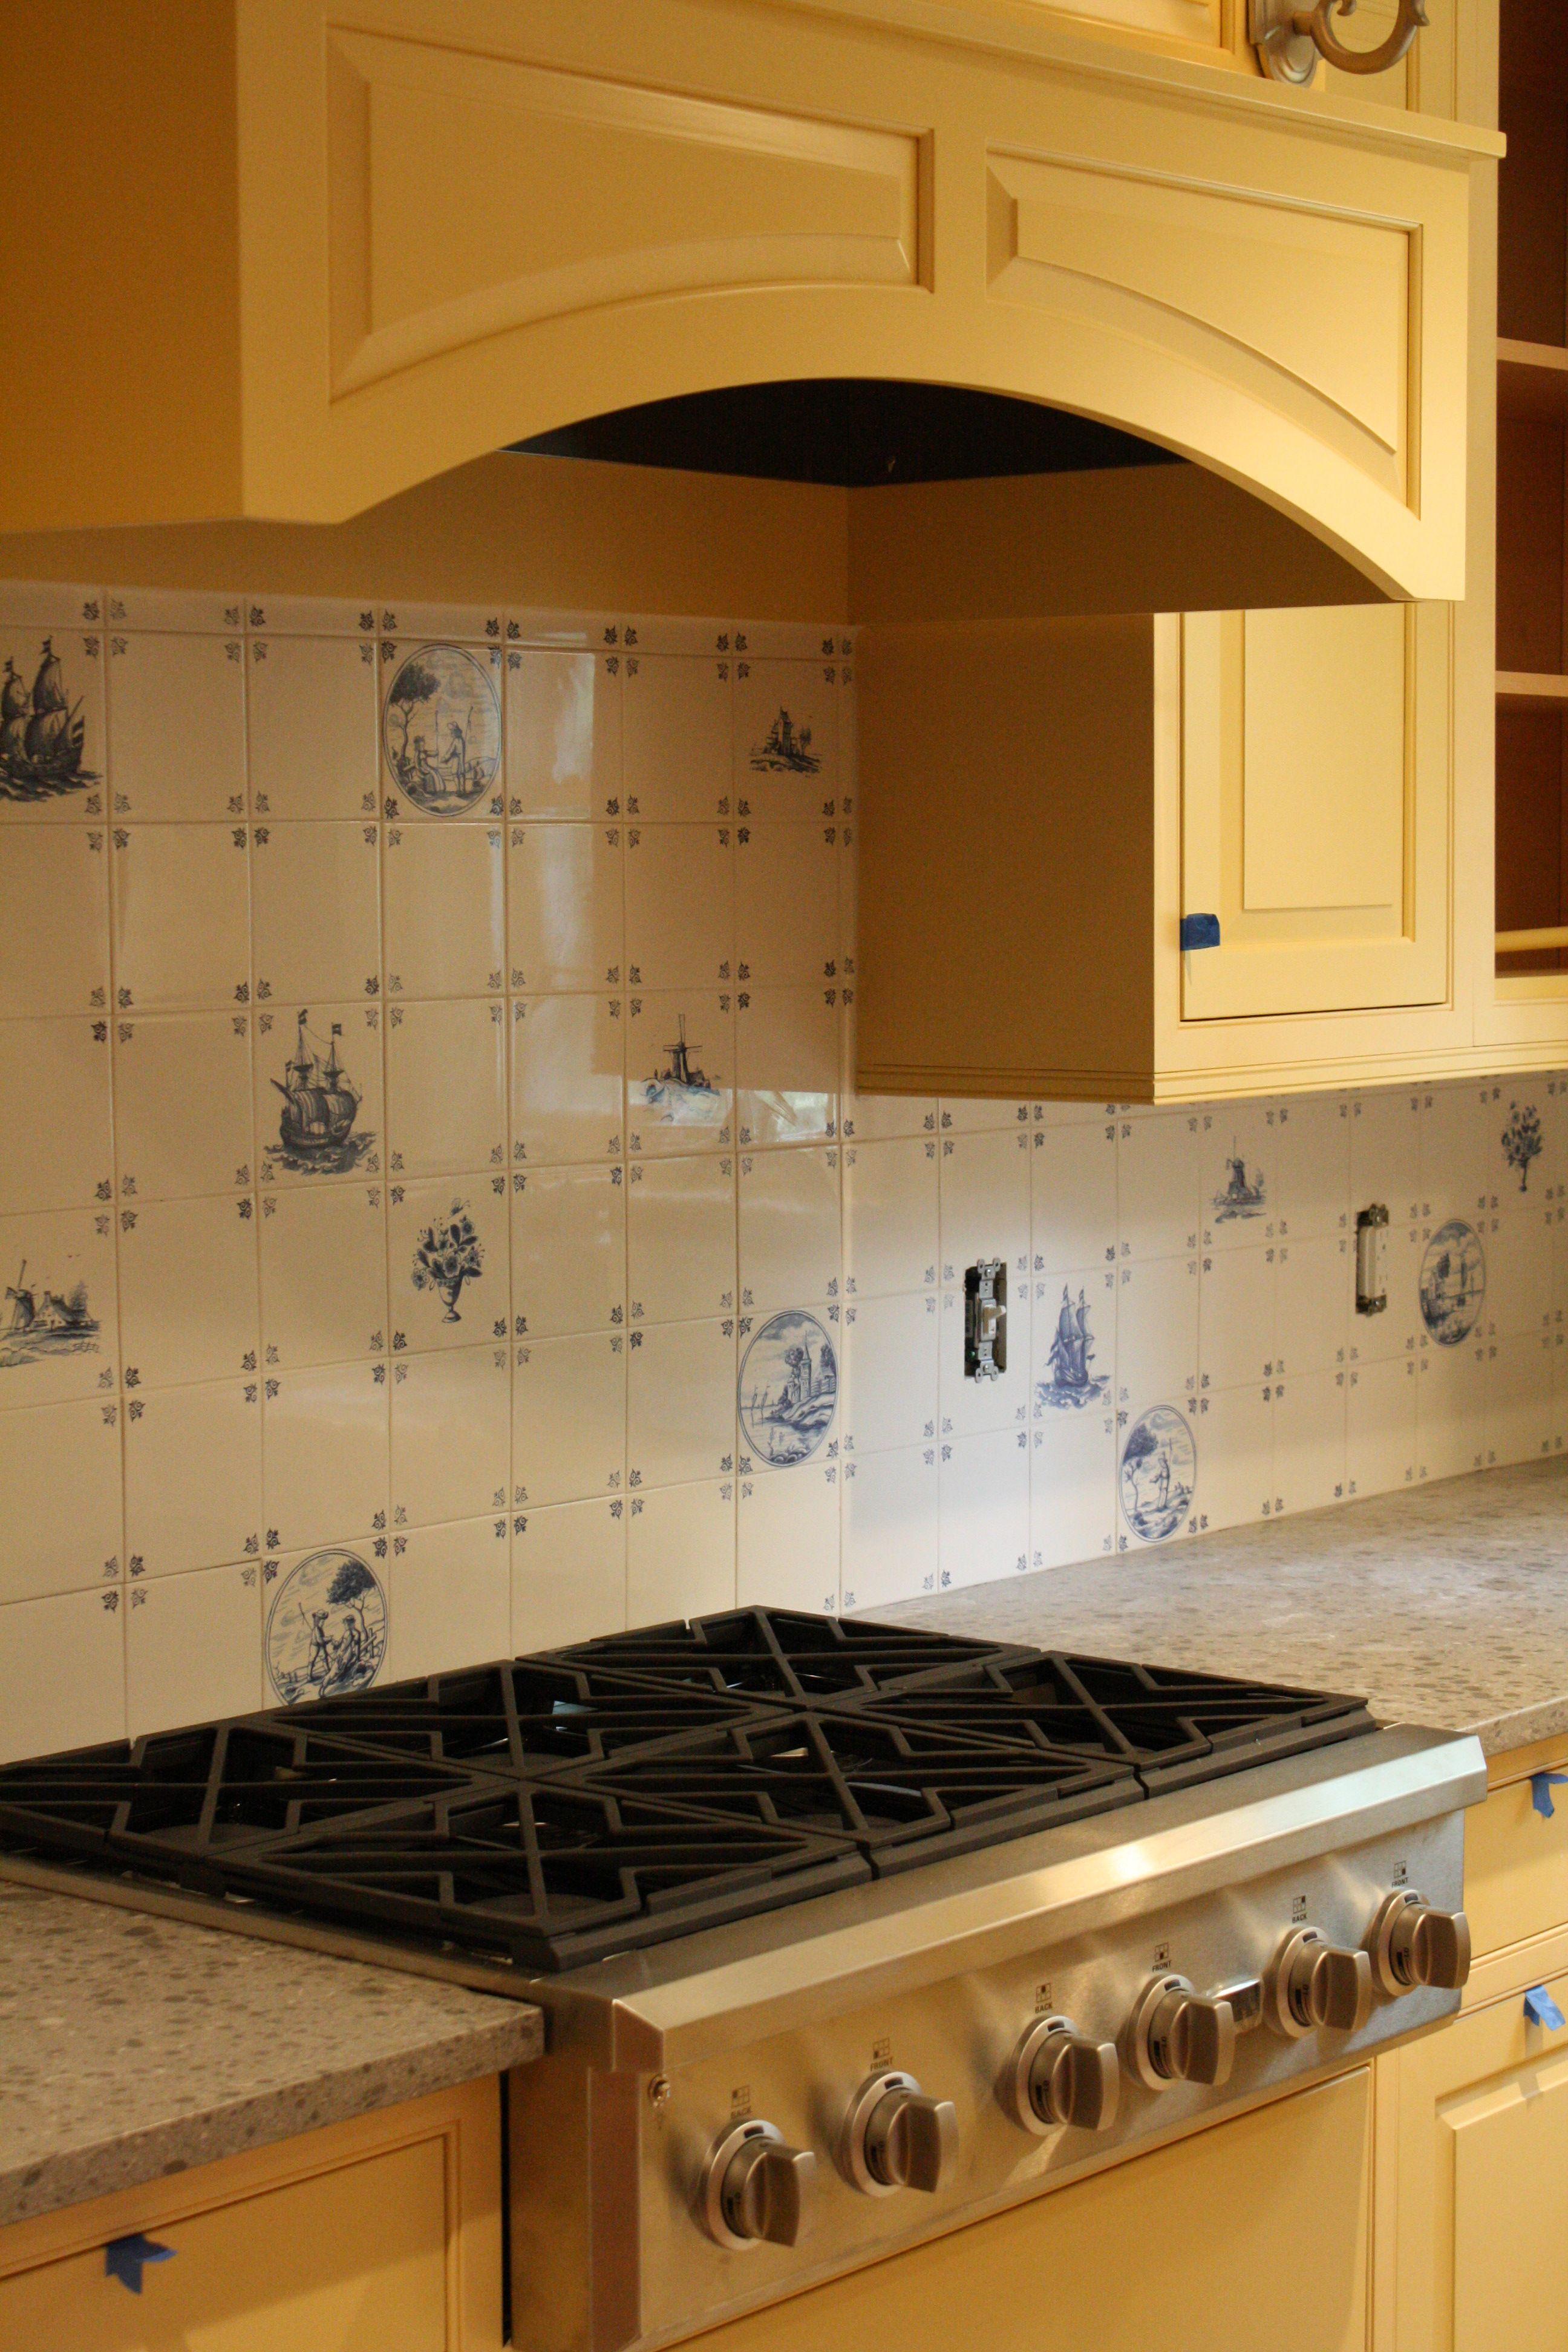 Delft Tile Back Splash Waterford Ct Cottage Kitchens White